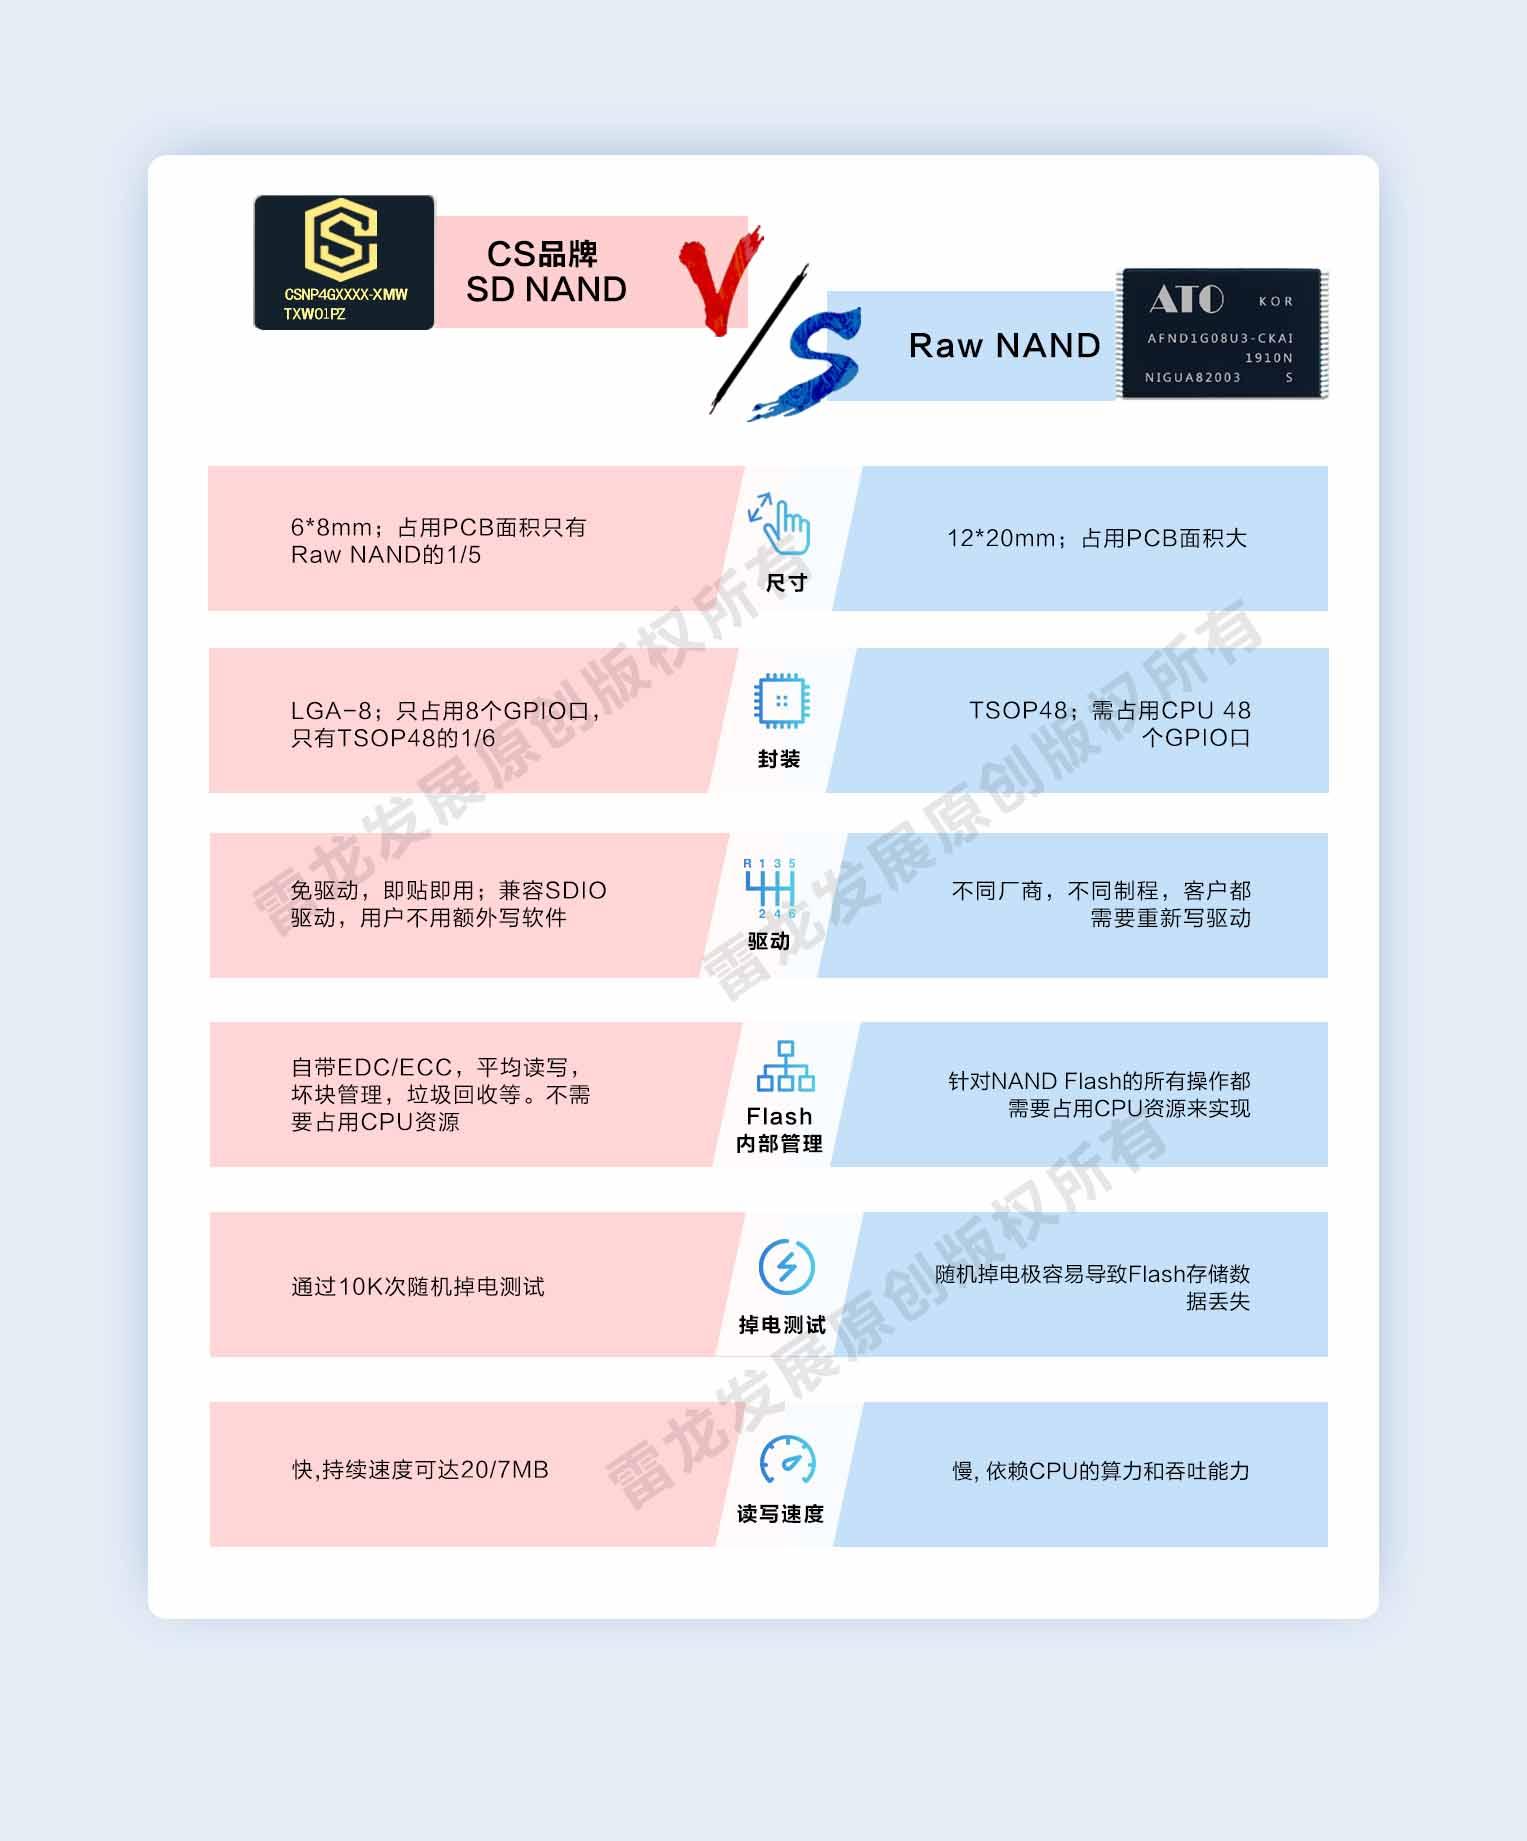 CS品牌SD NAND与Raw NAND对比